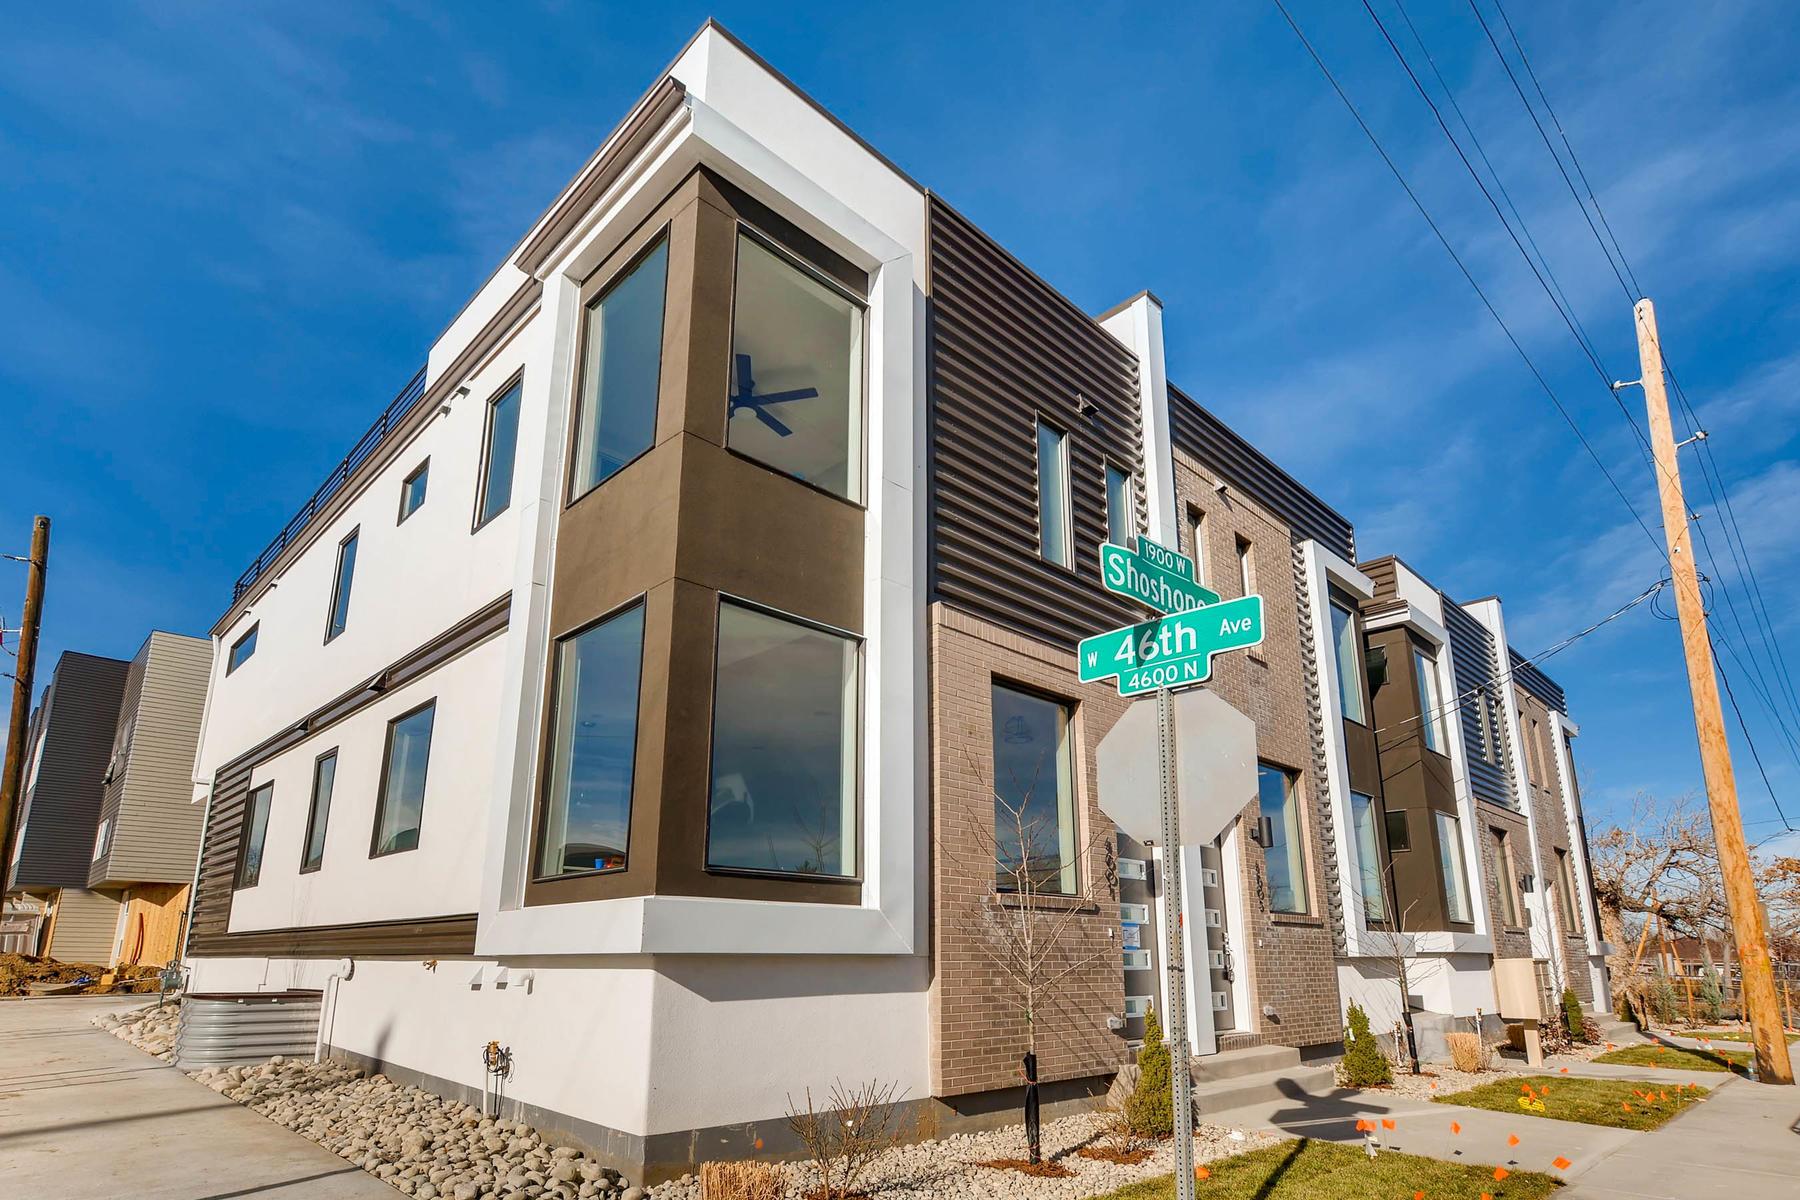 4605 Shoshone St Denver CO-MLS_Size-001-2-Exterior Front-1800x1200-72dpi